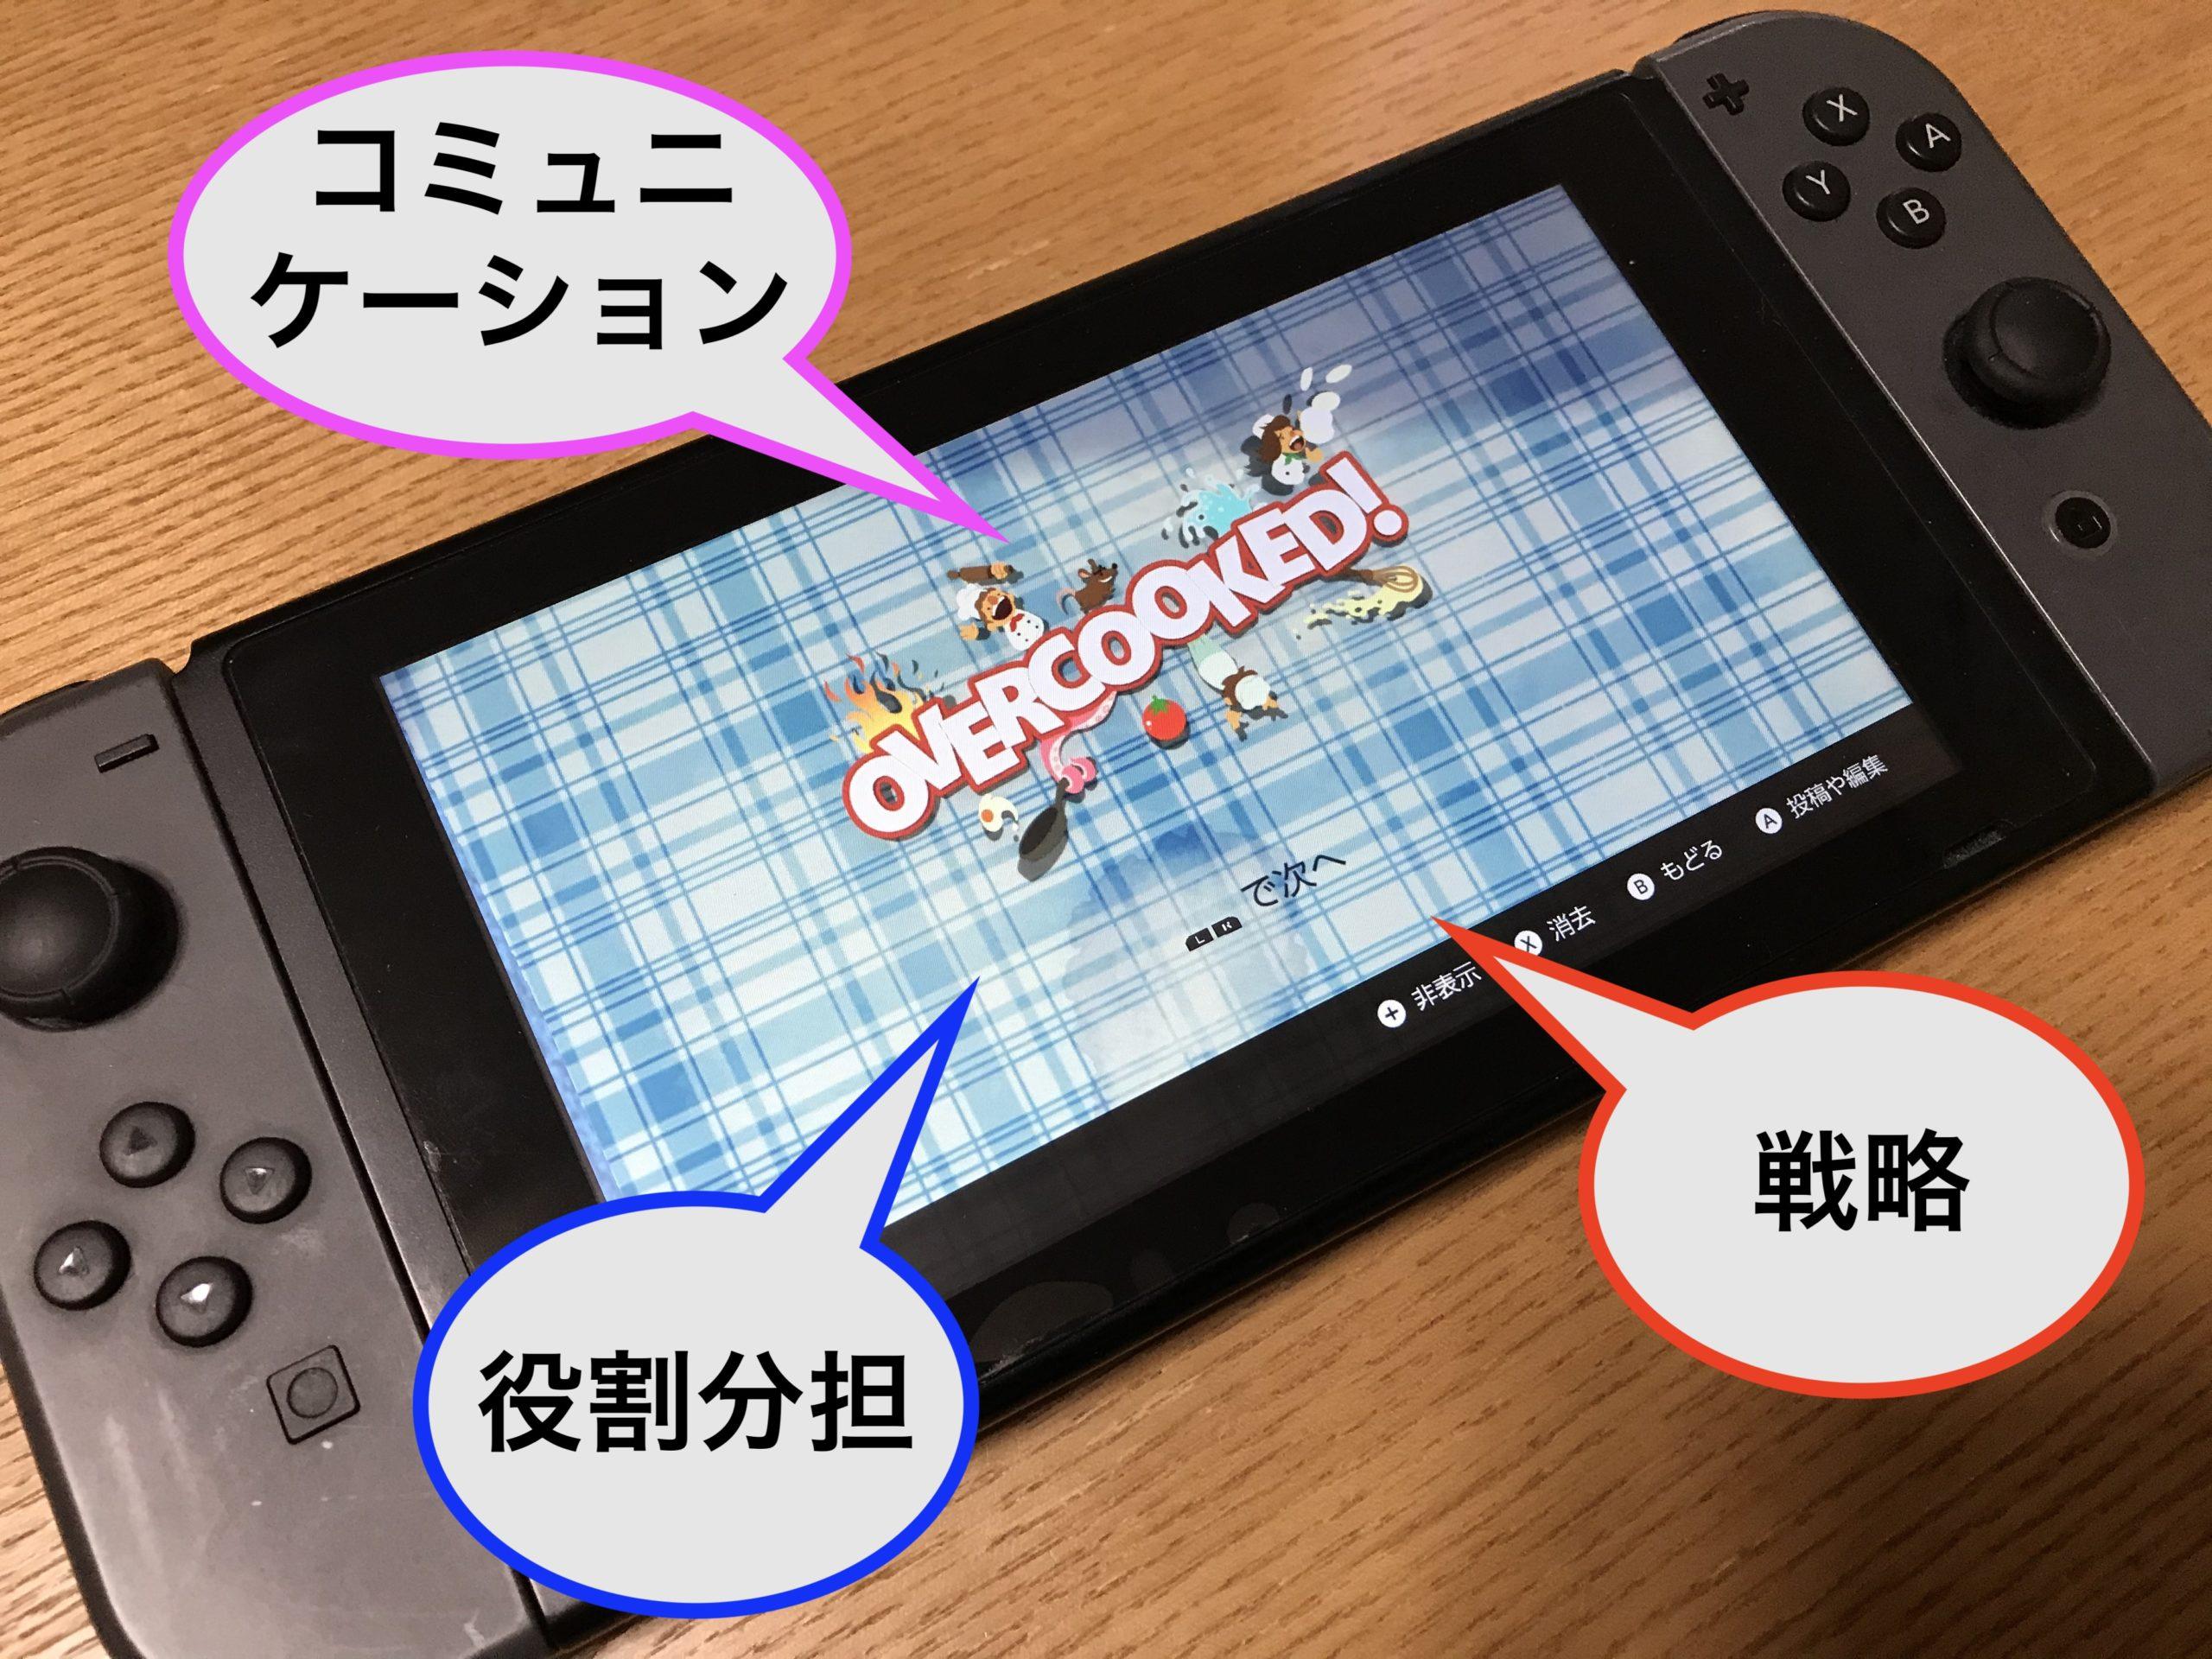 switch「オーバークック」は子供のコミュニケーション力UPに役立つ!